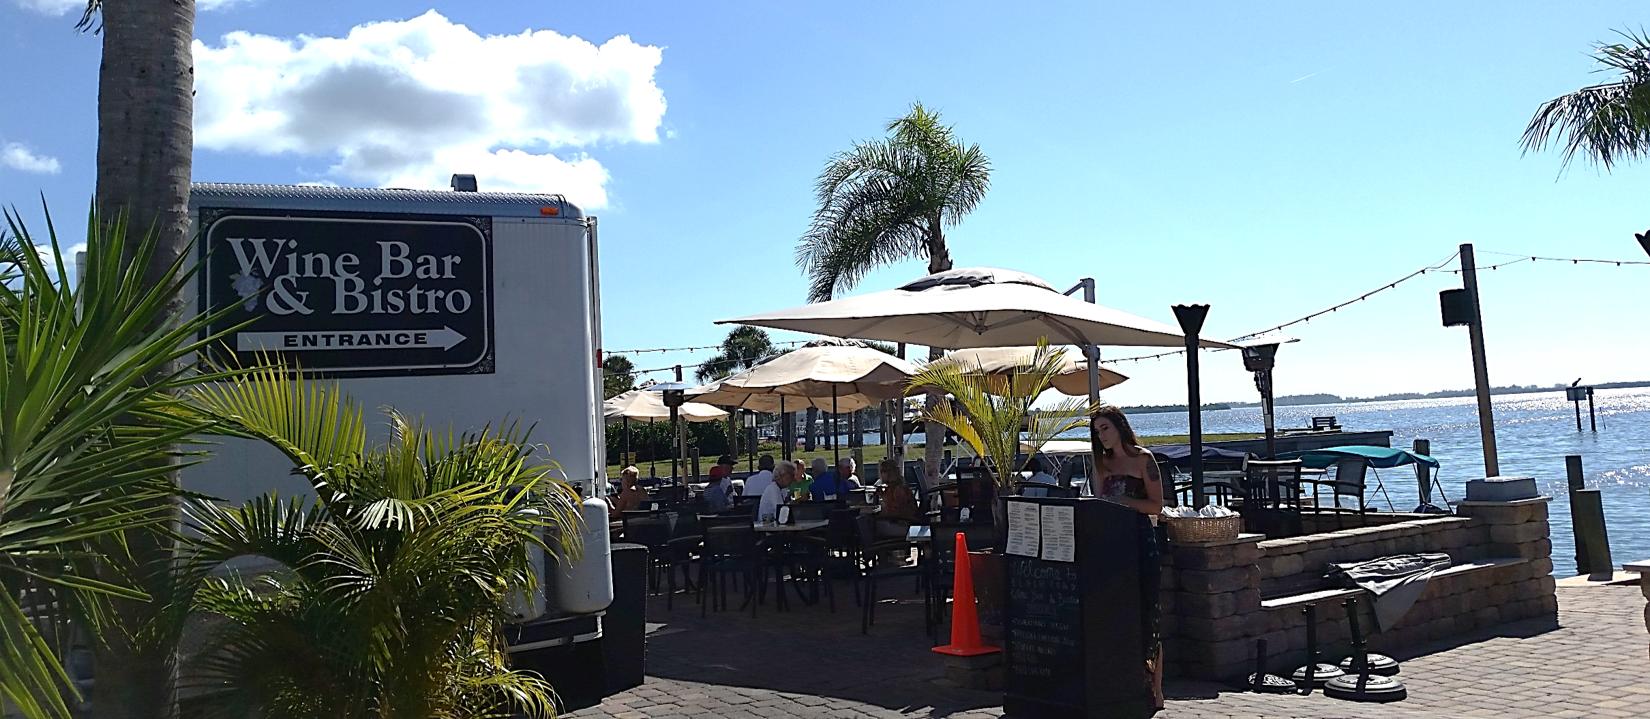 Wine Bar & Bistro on the Bay! | Manasota key florida ...